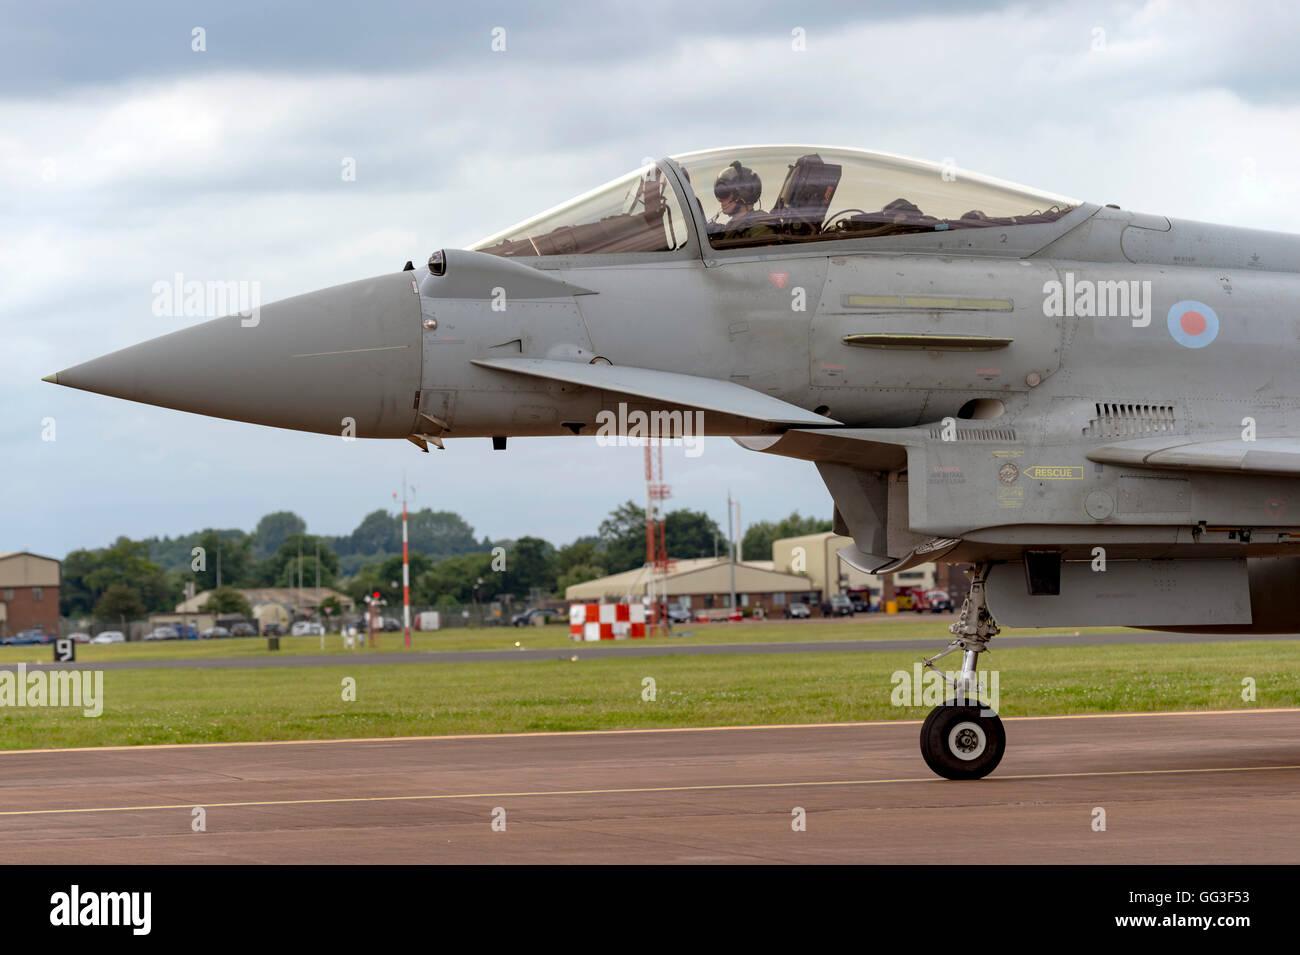 Eurofighter Typhoon FGR4, ZK329, Royal Air Force, at the Royal International Air Tattoo 2016 - Stock Image